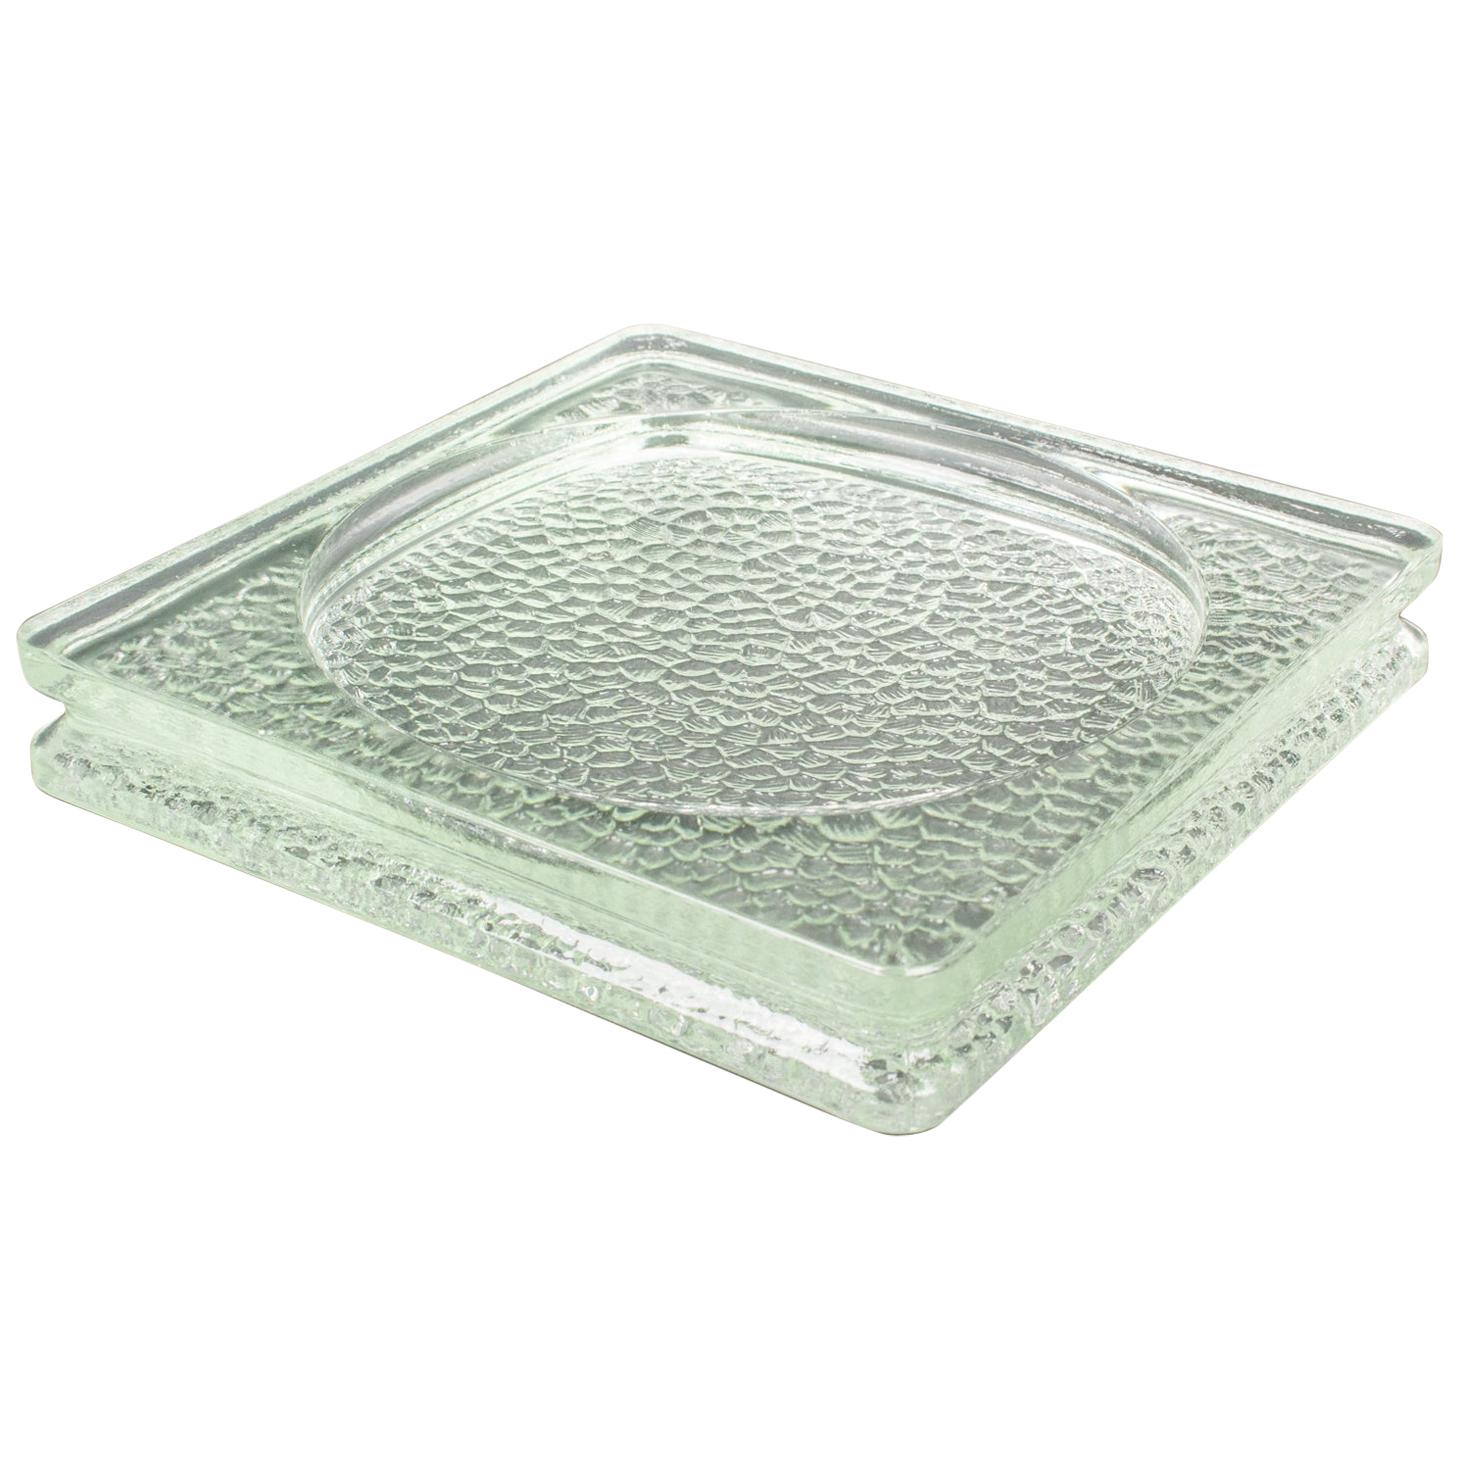 Lumax Nevada Glass Desk Tidy Catchall Ashtray by Le Corbusier